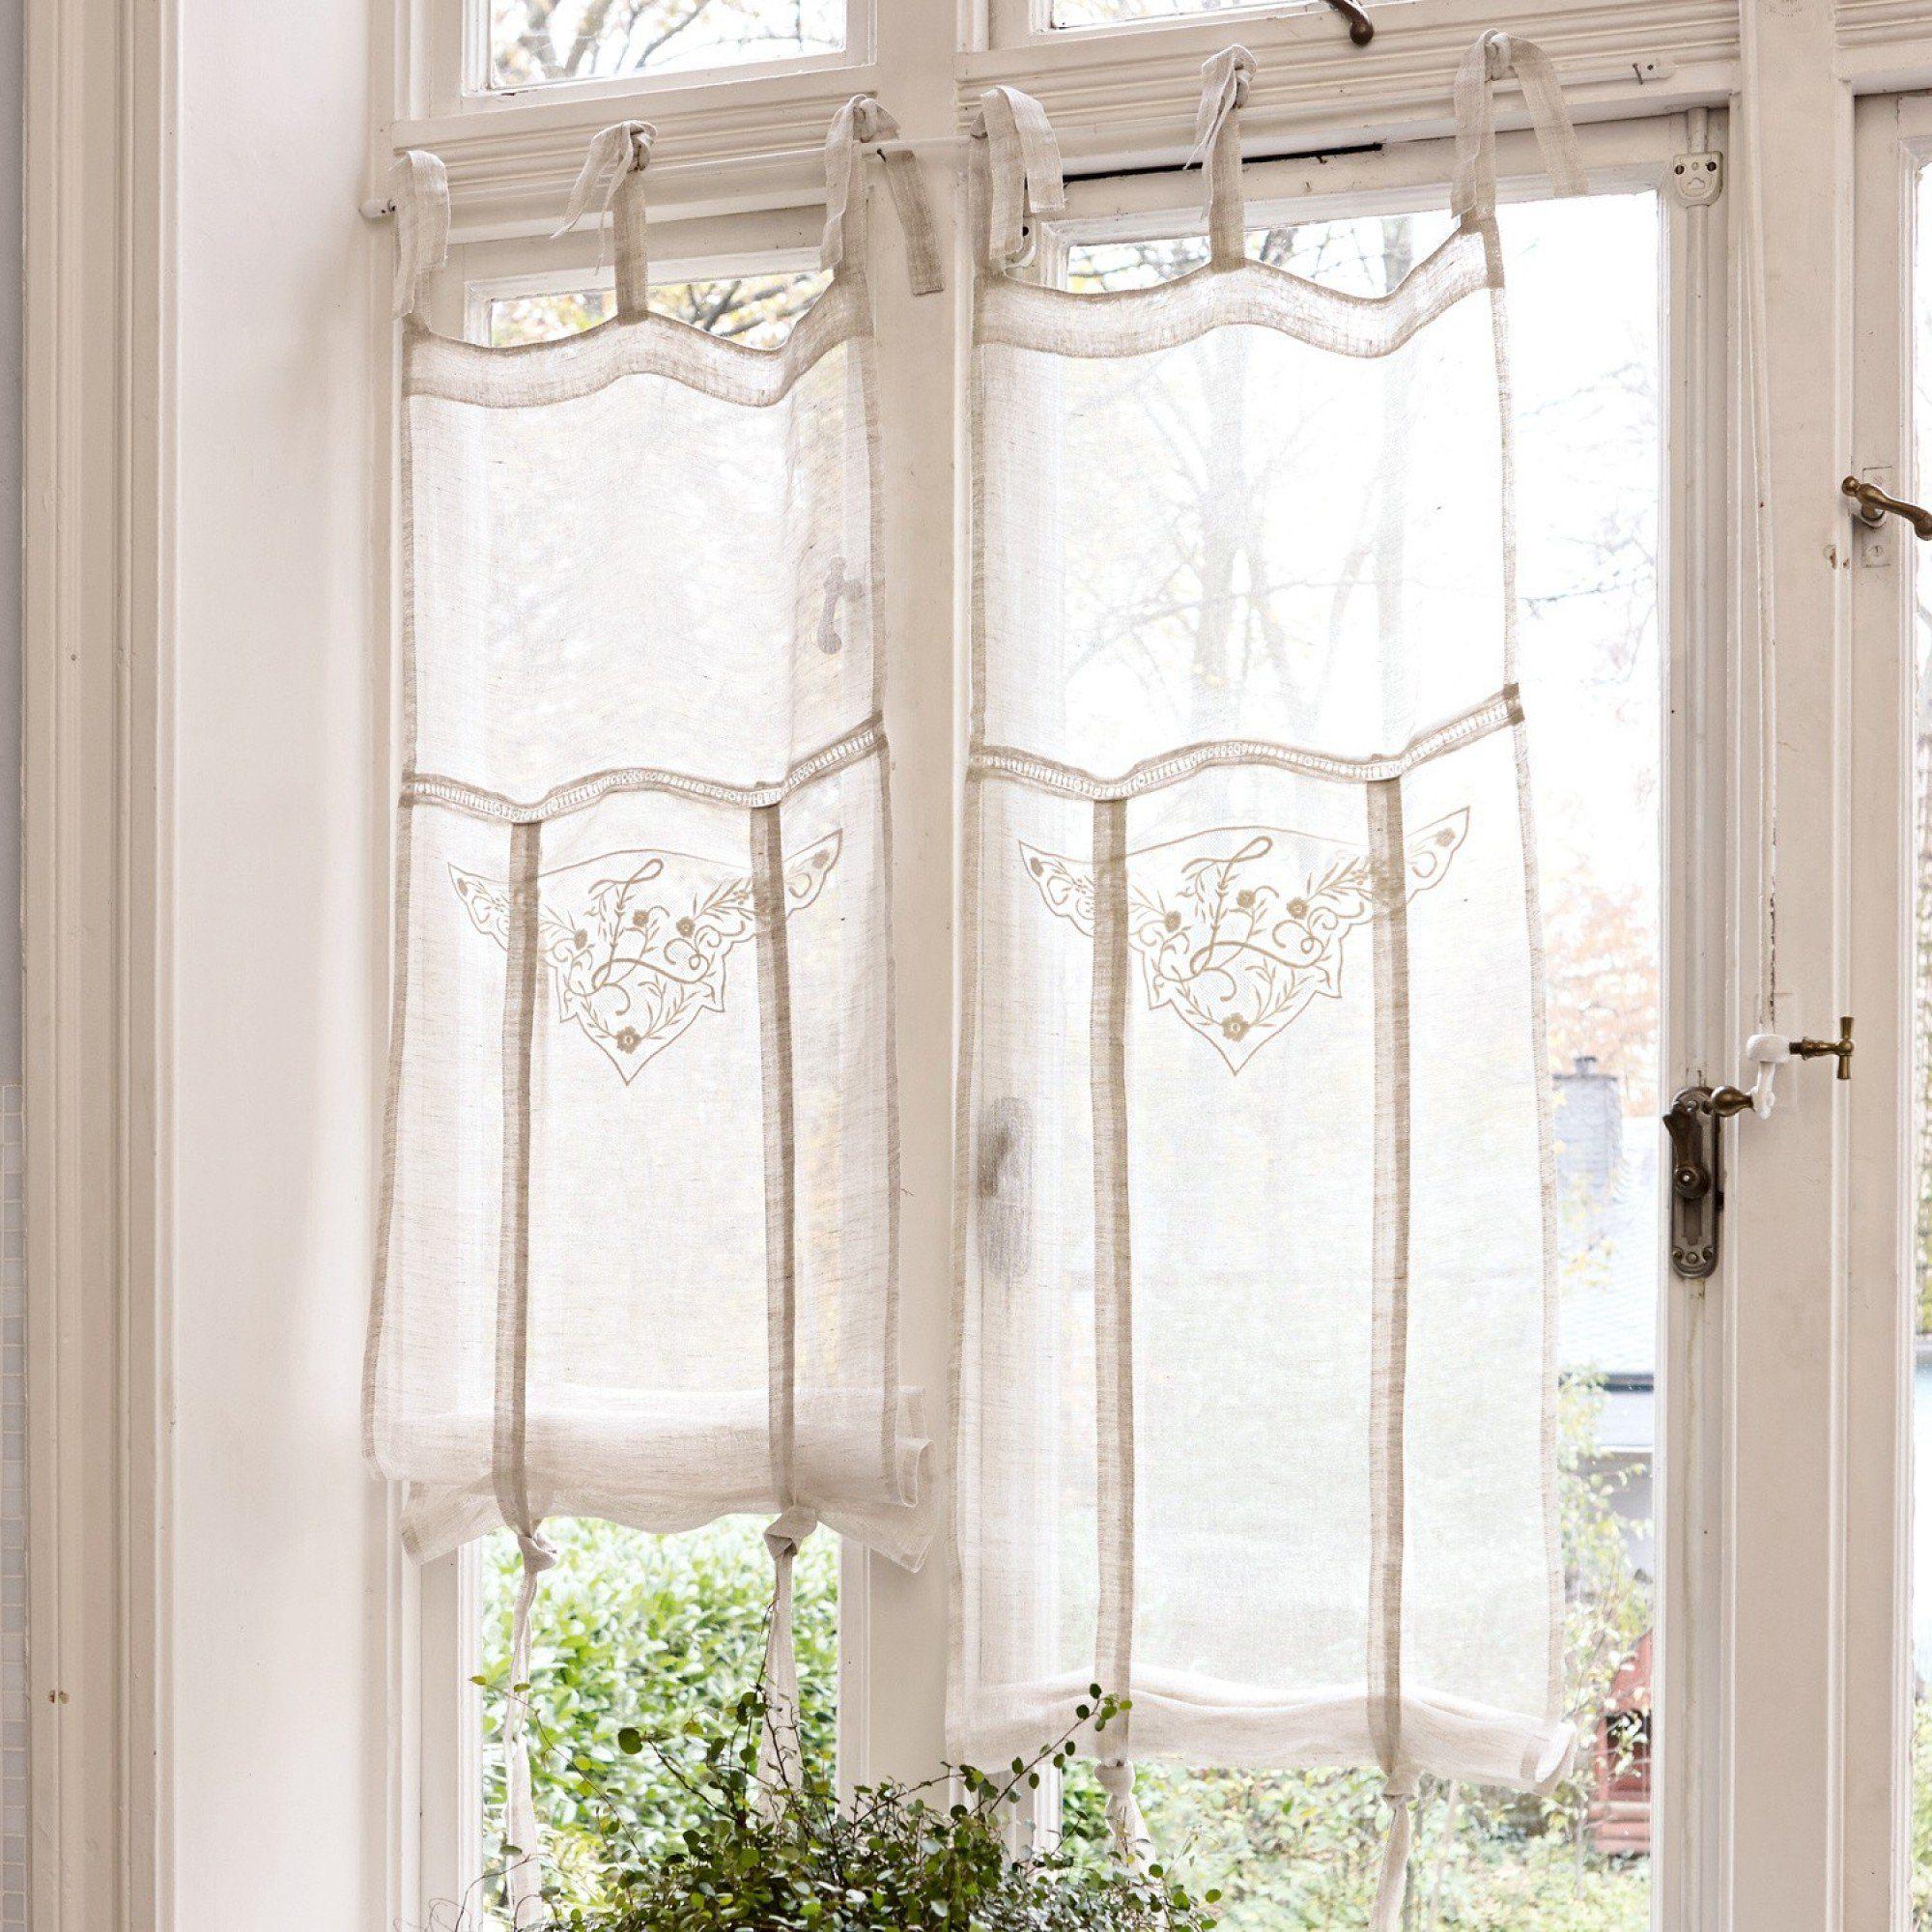 Loberon Romantische Gardine Espaon Im Landhausstil Creme Gardinen Landhausstil Vorhange Gardinen